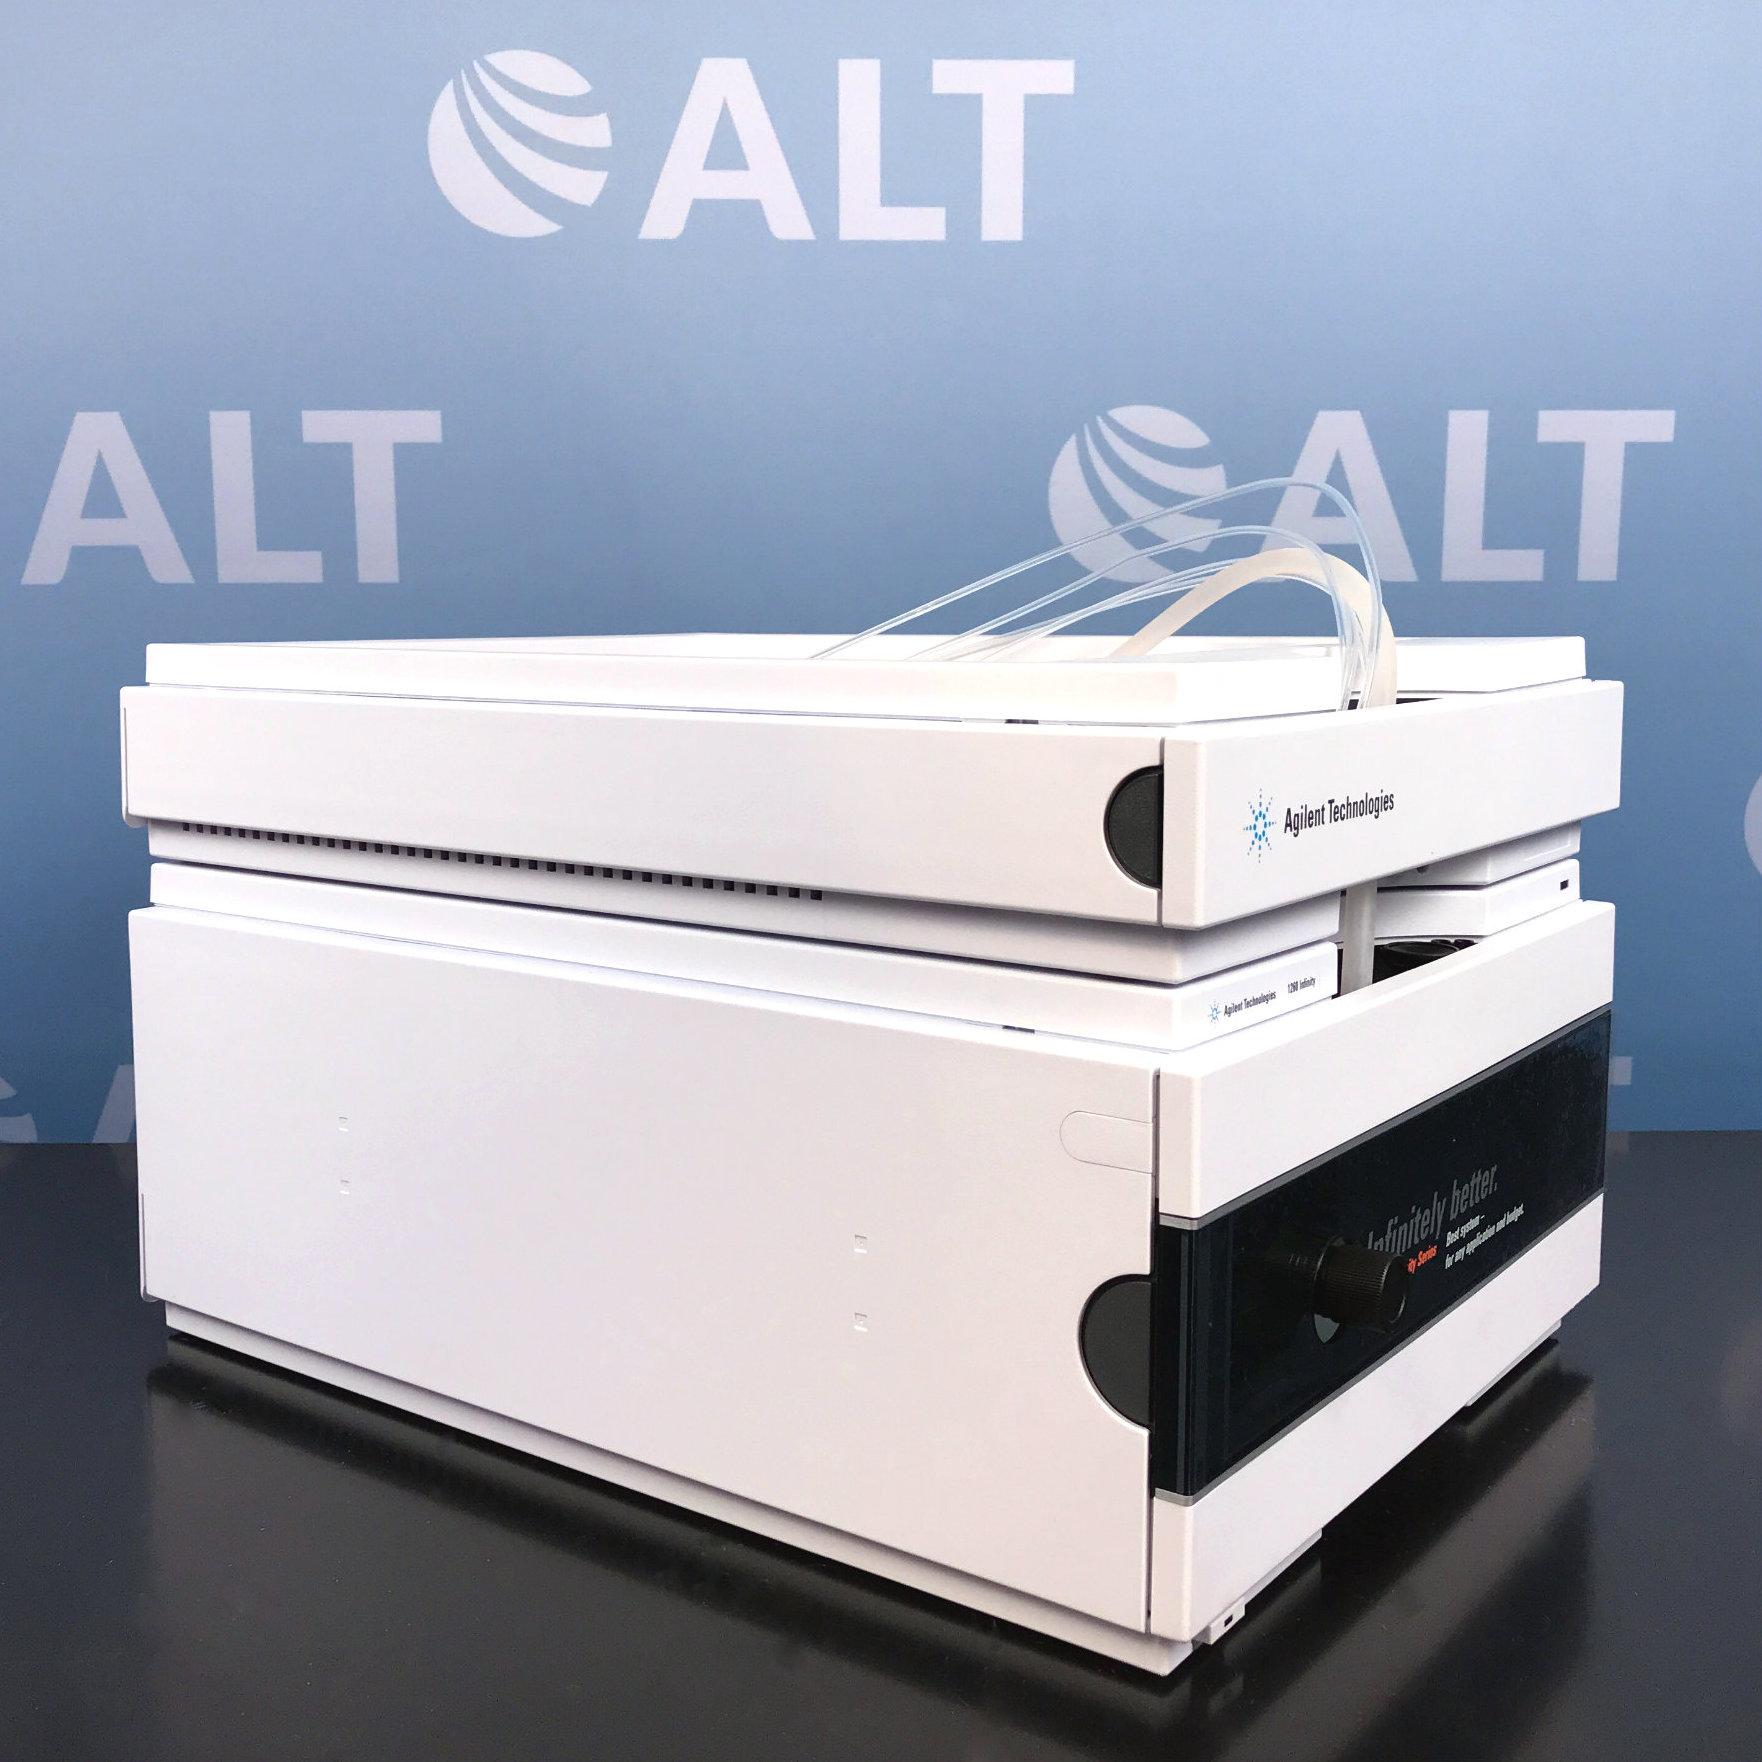 Agilent Technologies G1311B 1260 Quaternary Pump  Image